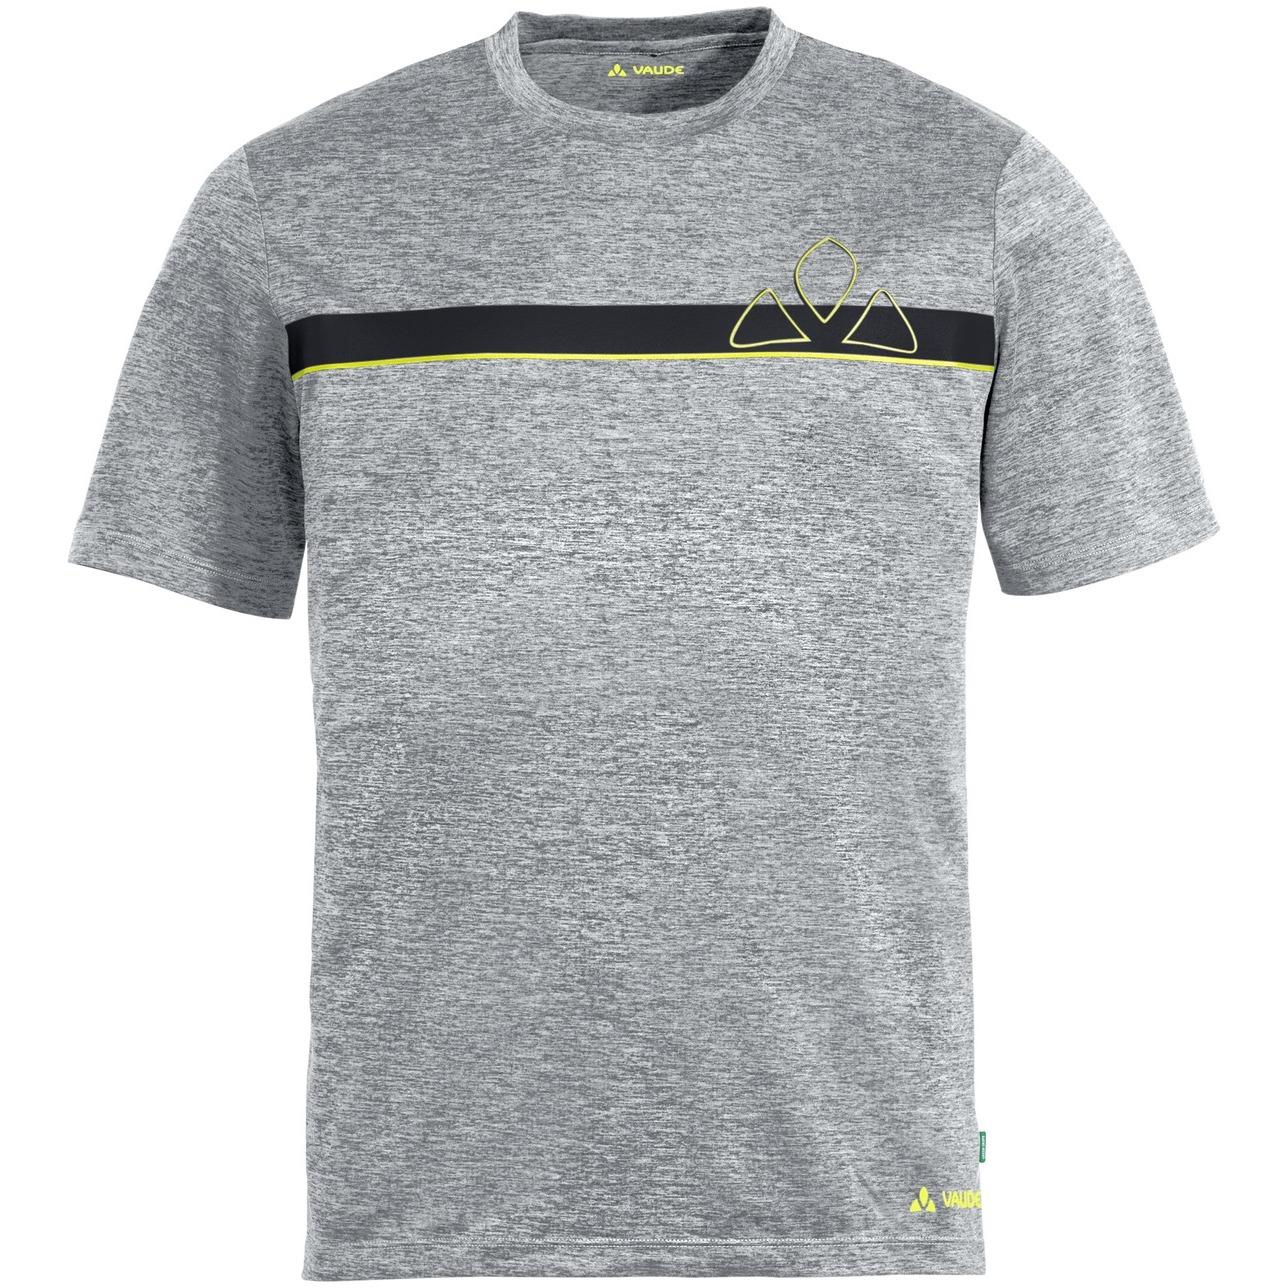 Vaude Men's Bracket T-Shirt - black